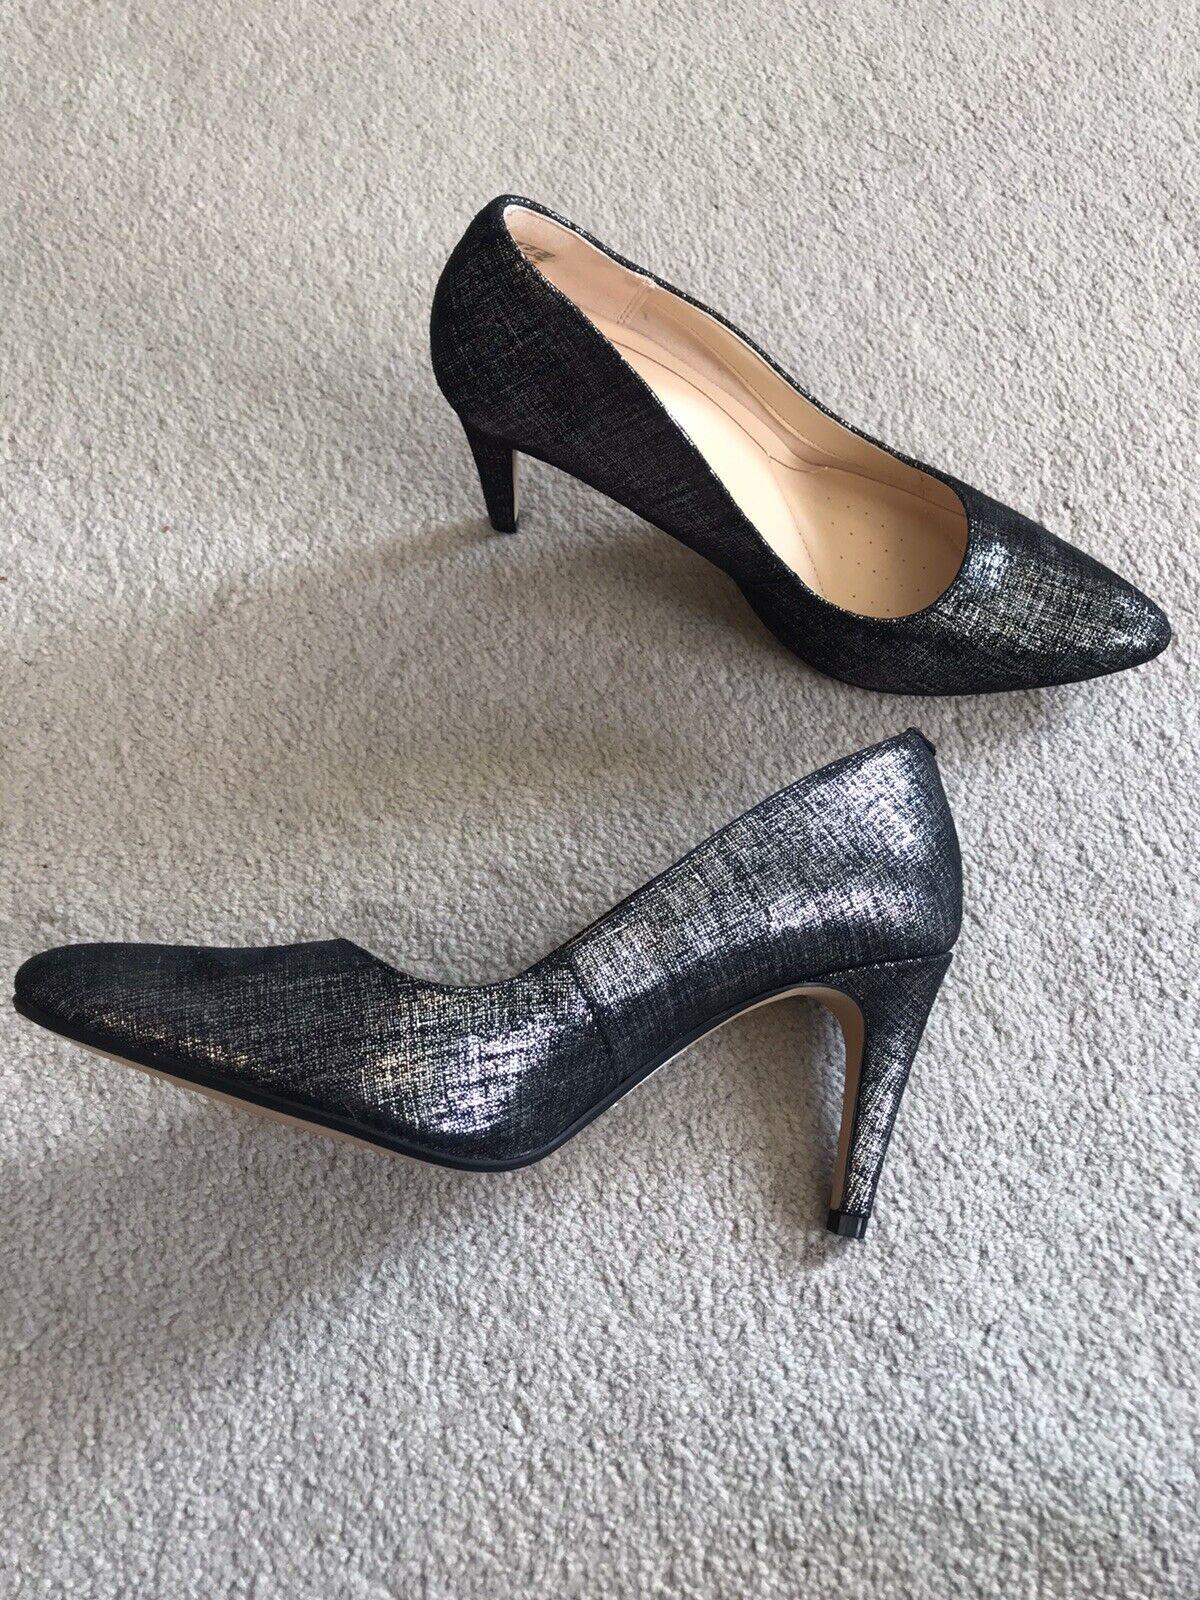 Womens Black / Metallic Size 6 Stilleto Mid Heel Brand New RRP